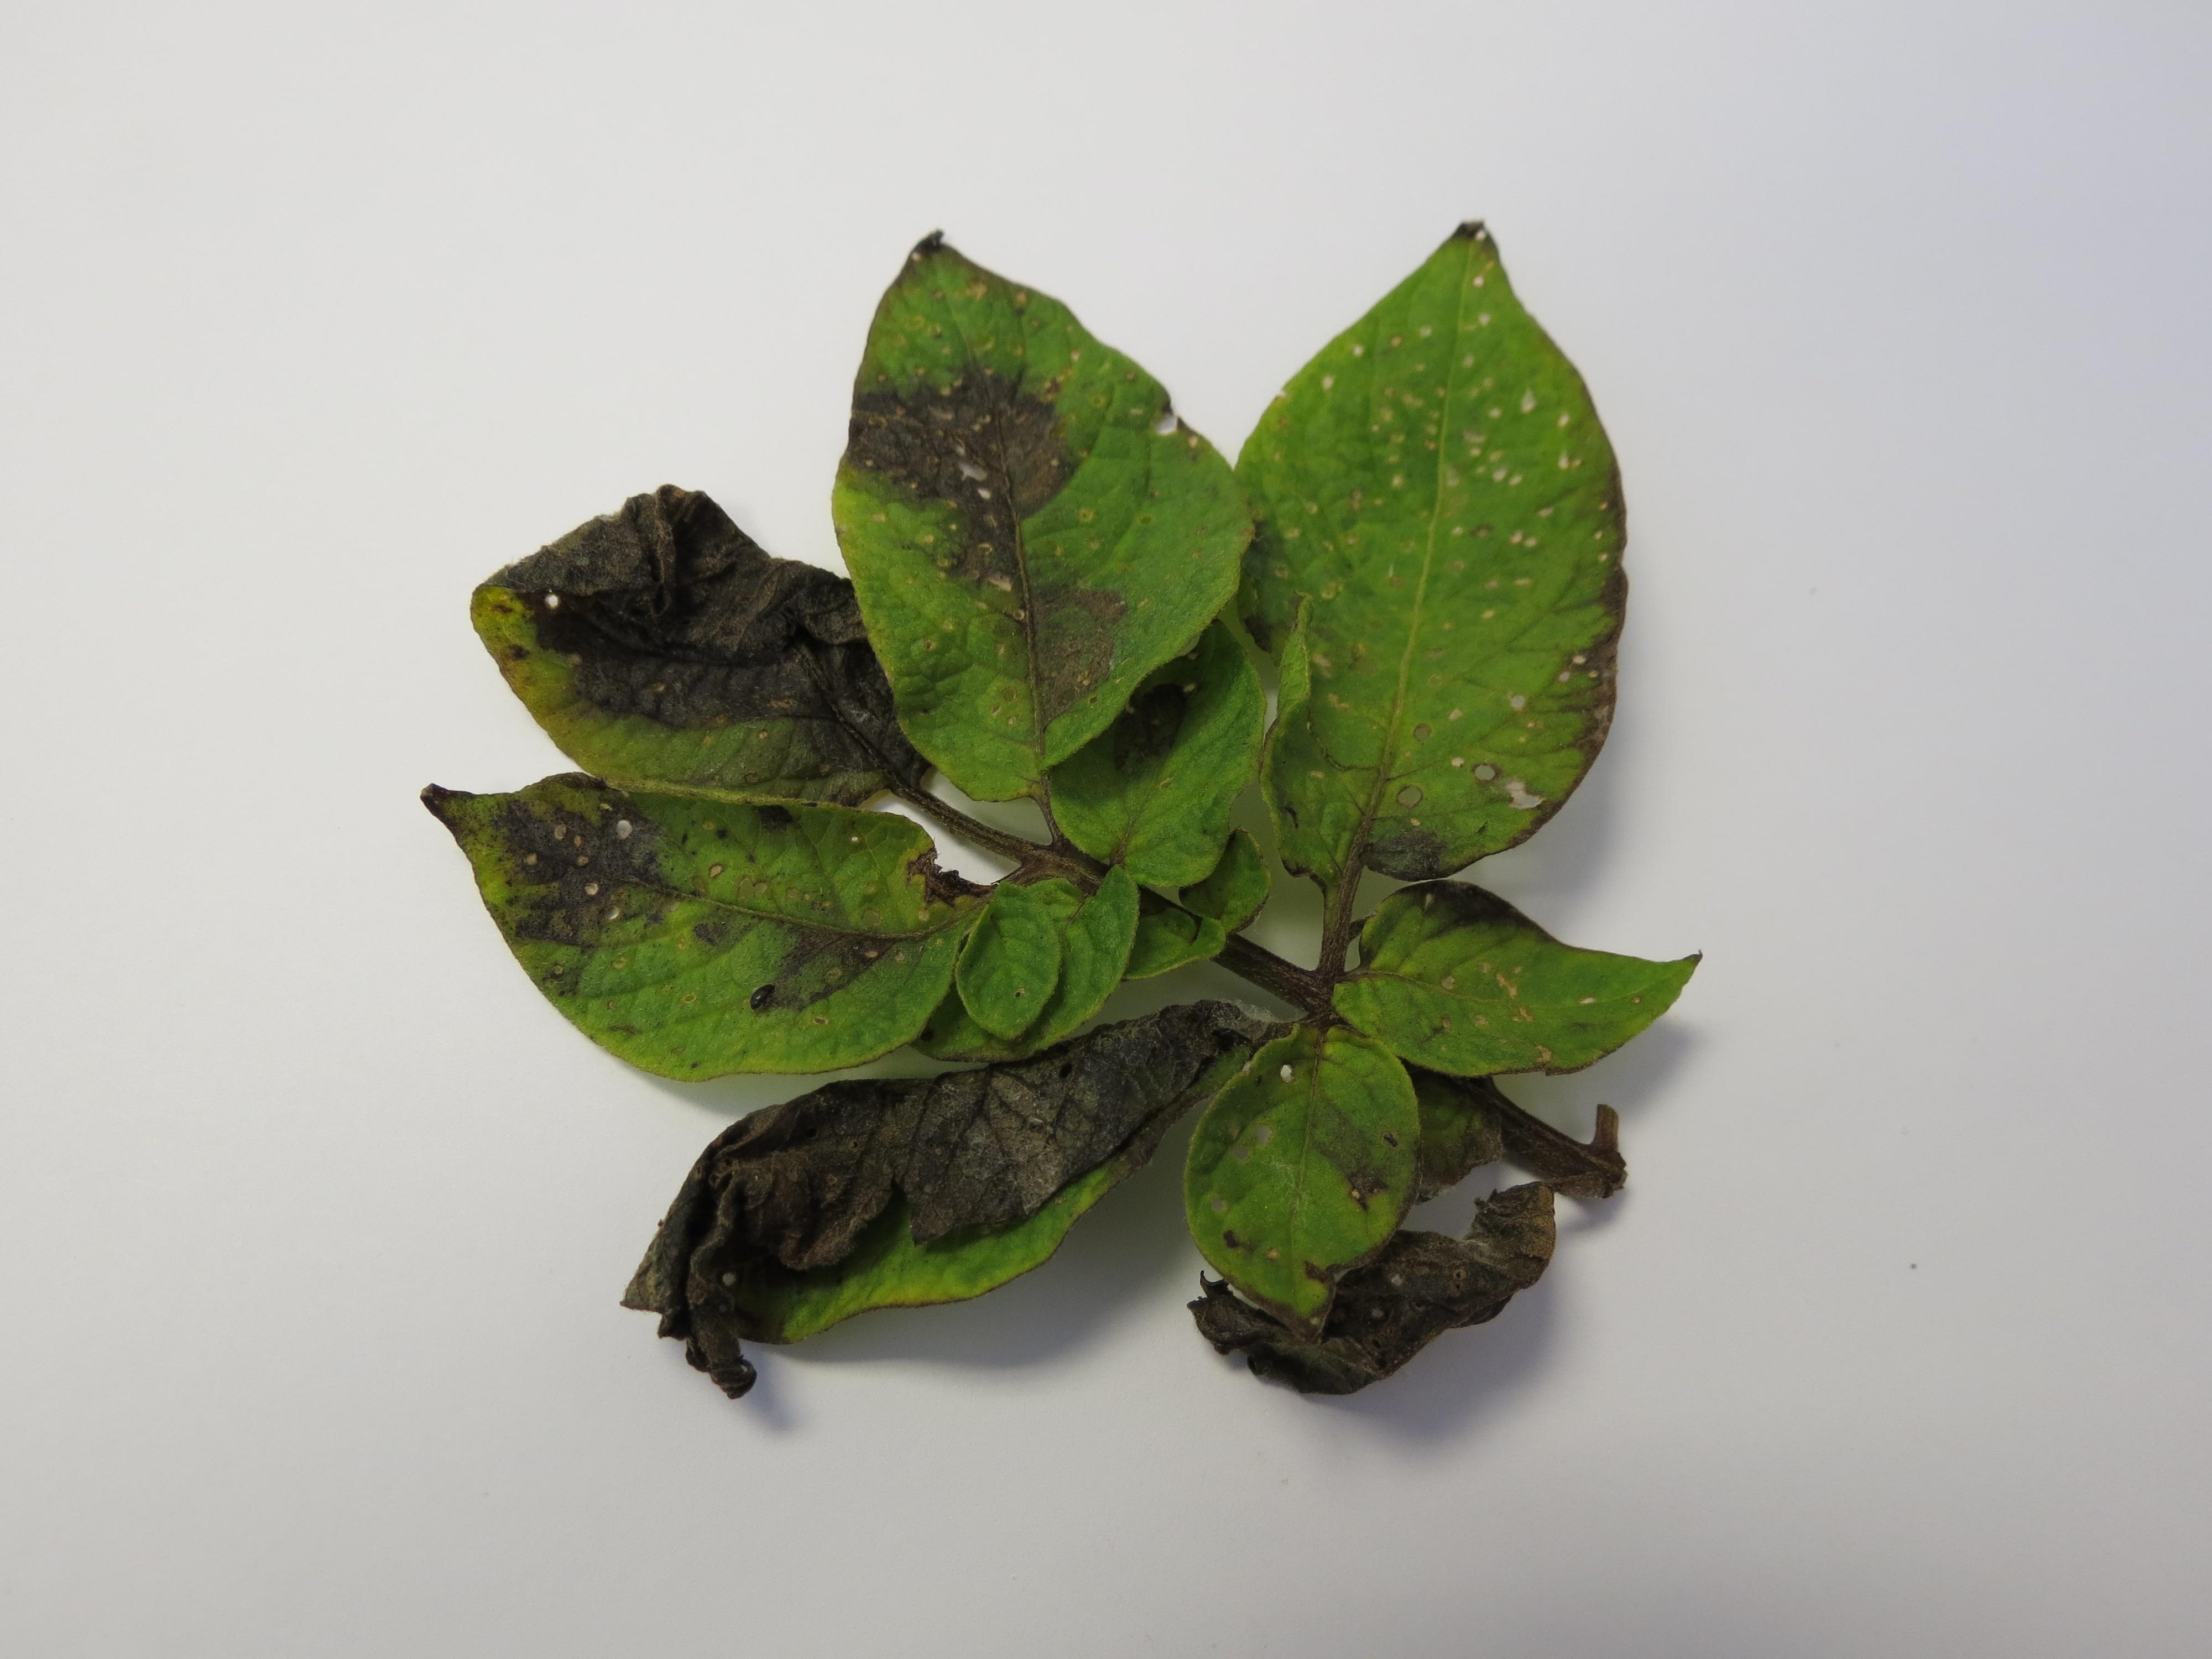 Late blight on potato leaf (Photo Lina Quesada, NCSU vegetable pathology)